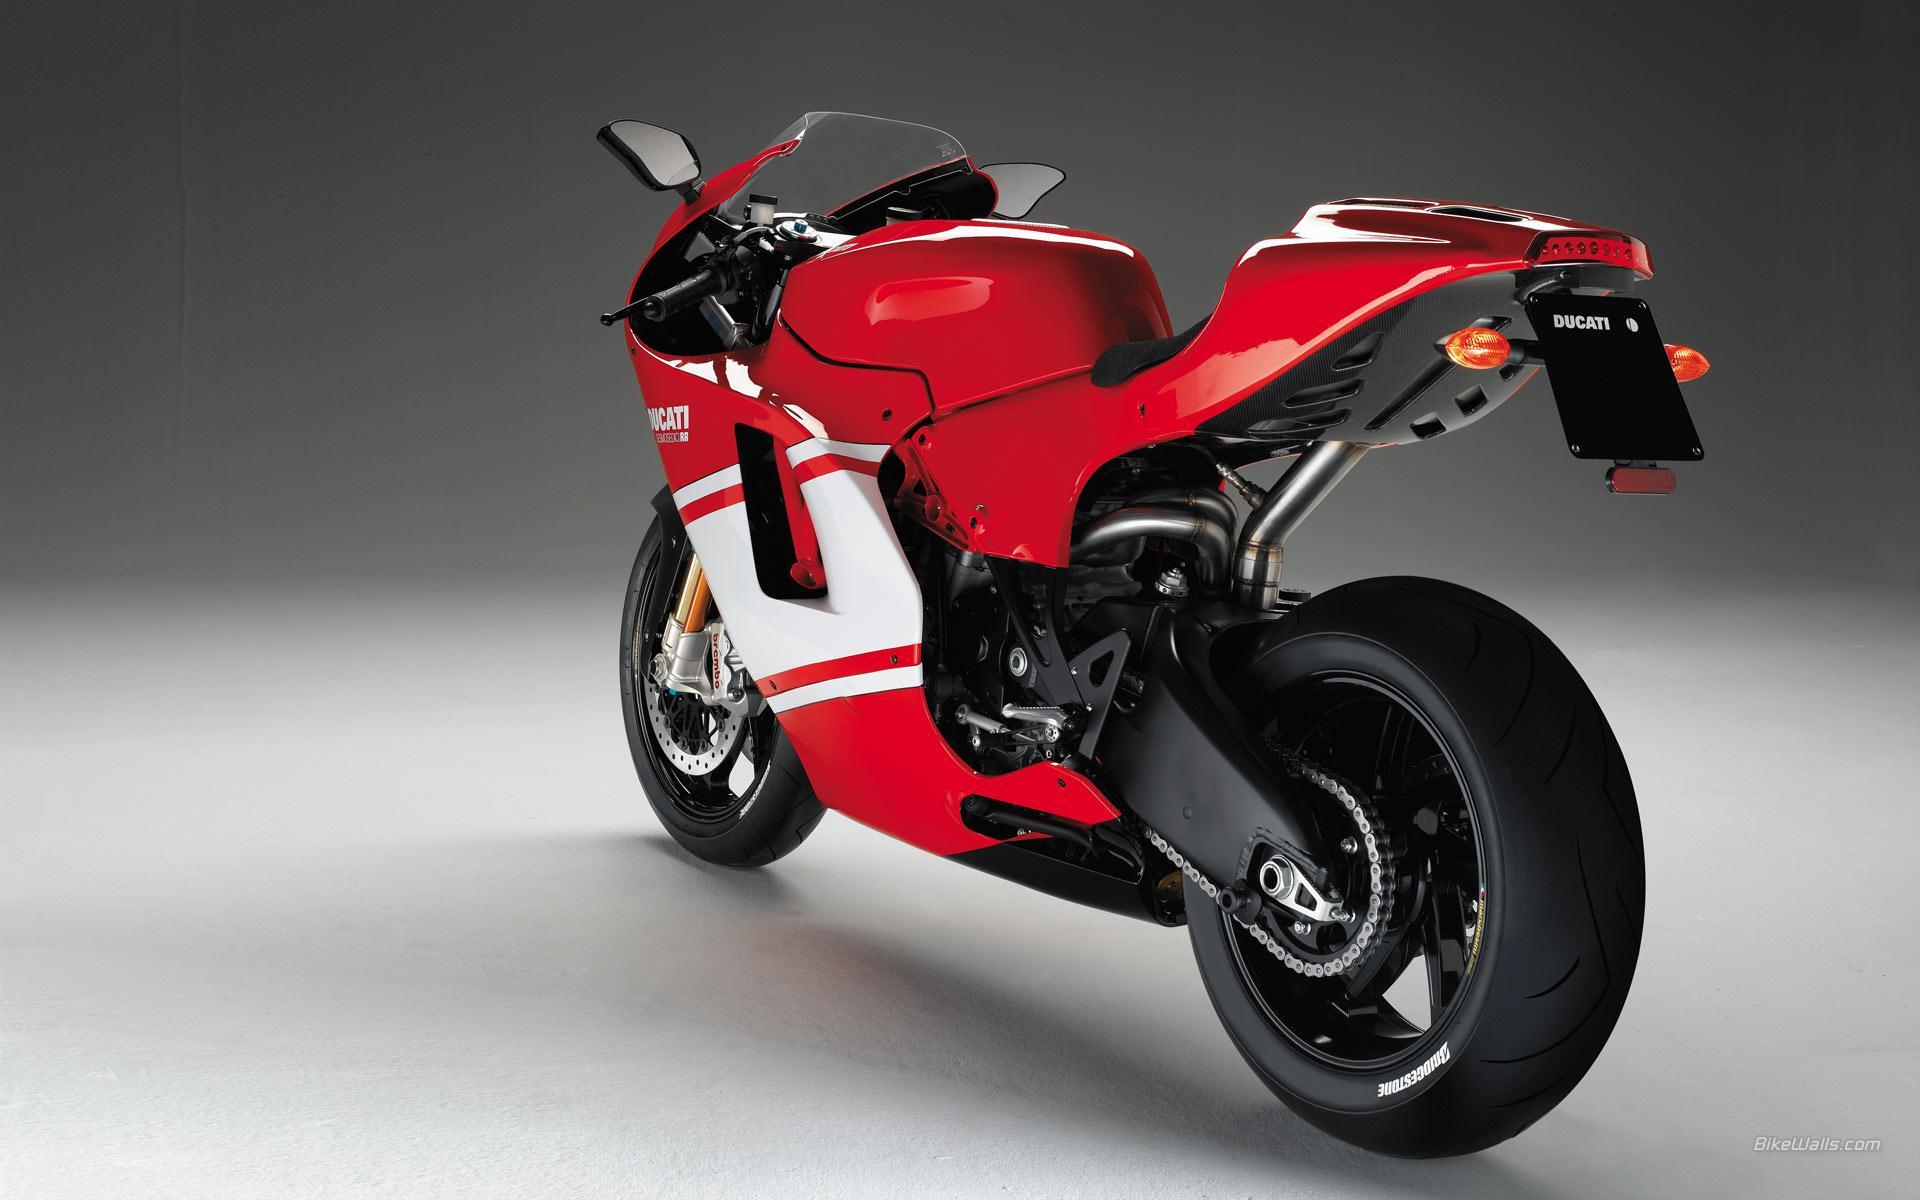 Обои Ducati, rr, desmosedici. Мотоциклы foto 6